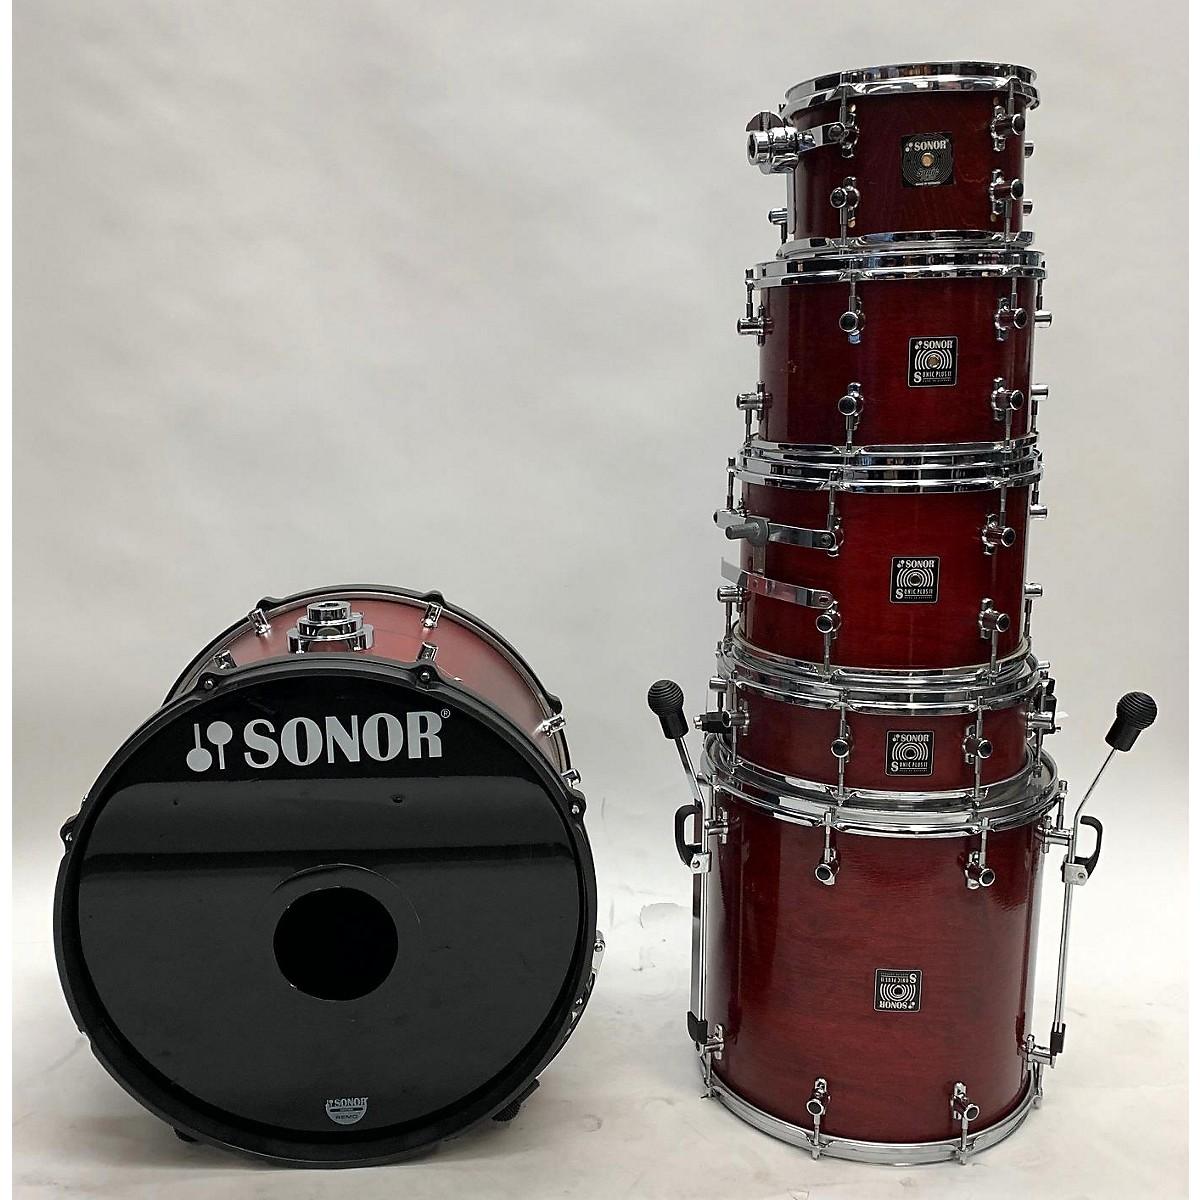 Sonor SONIC PLUS II Drum Kit